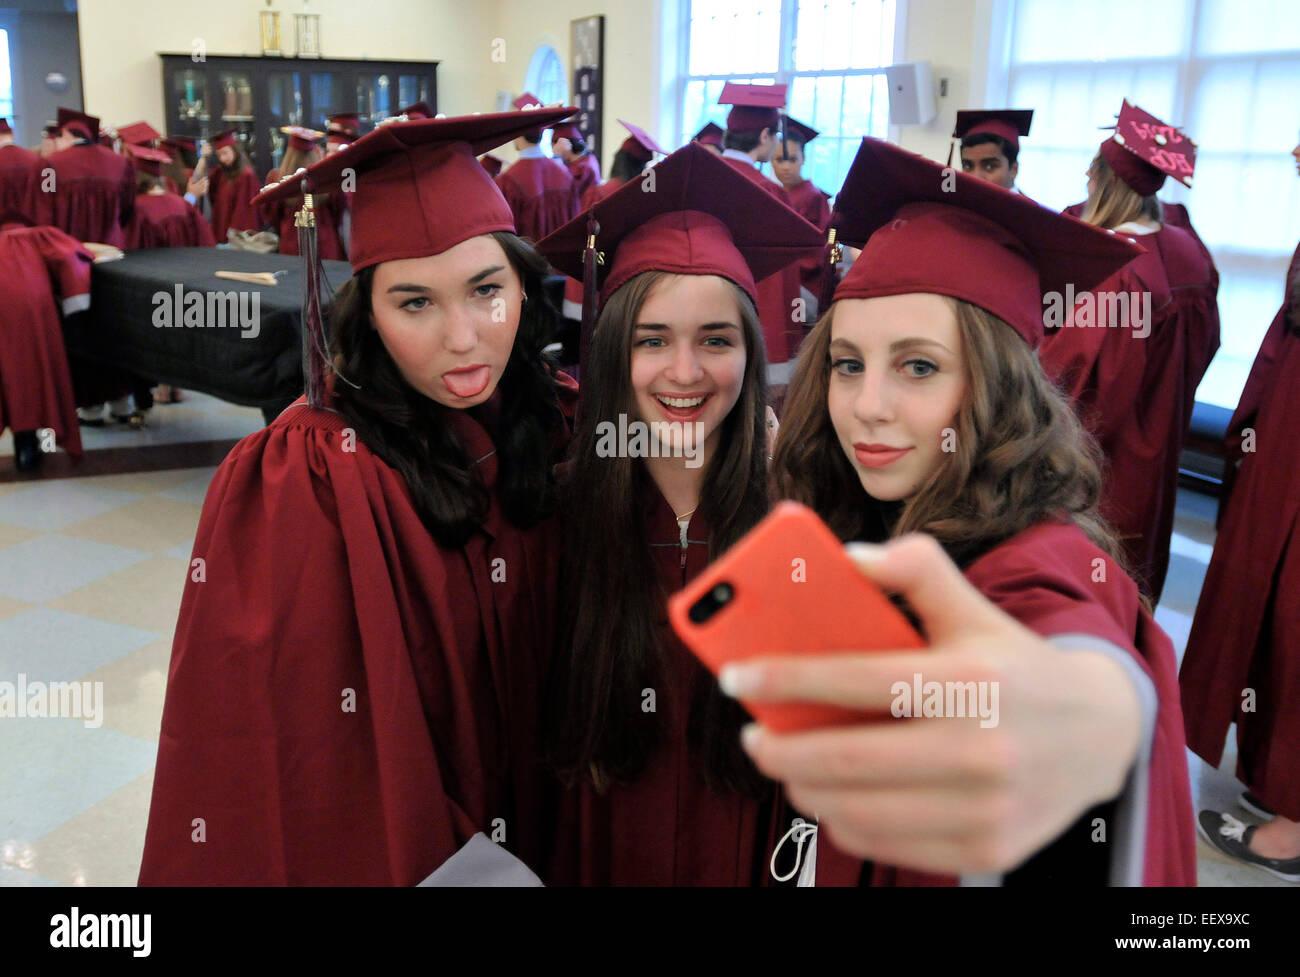 CT USA Graduates Abby Schrader, left, Alisa Pasichnik, center, and Zoe Loewenberg take a 'selfie' before - Stock Image